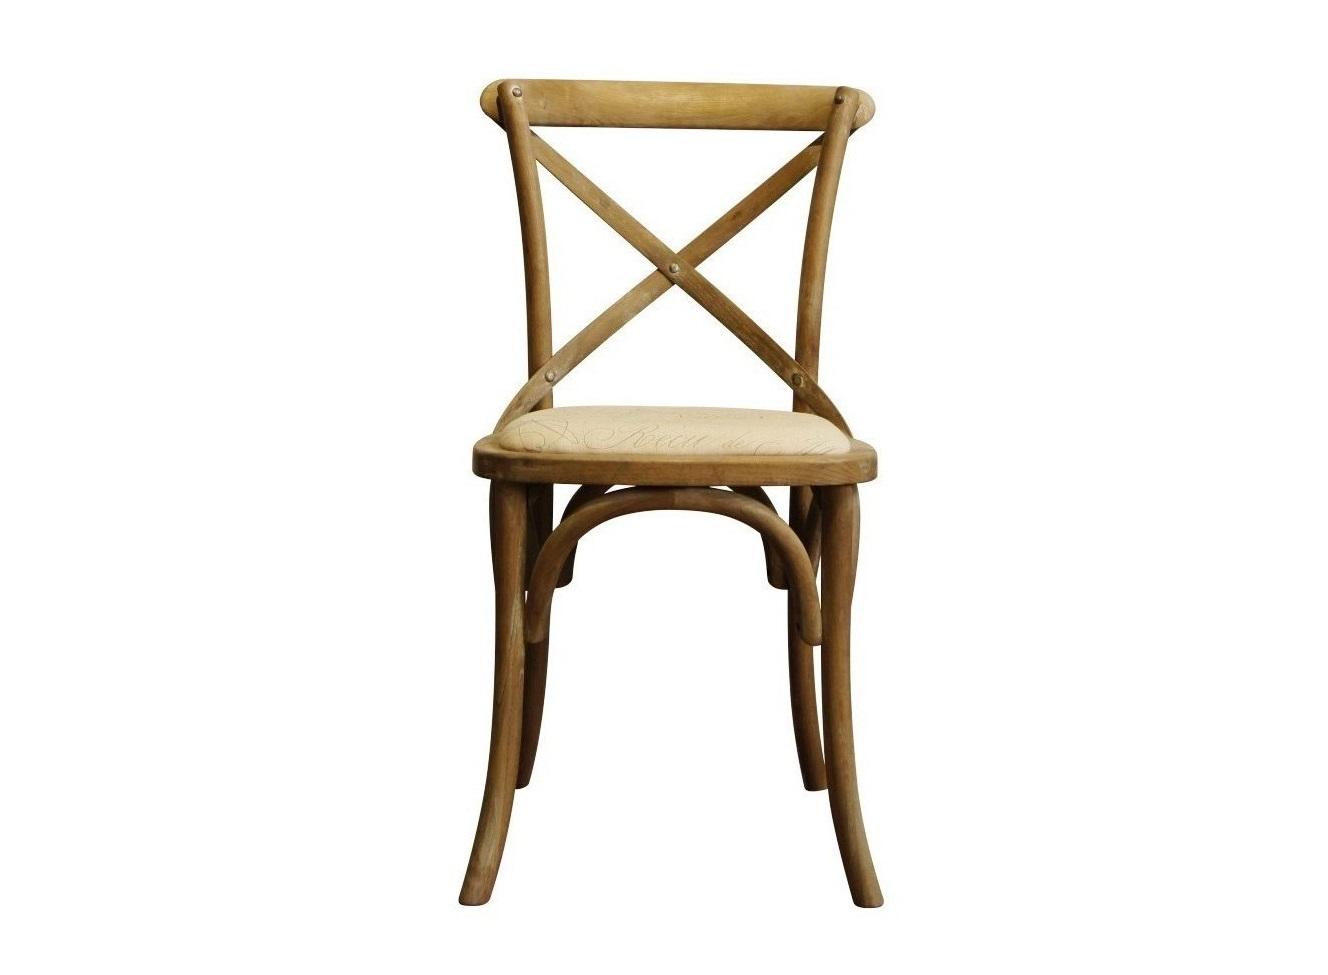 Стул СountryОбеденные стулья<br>Вес: 10  кг,&amp;lt;div&amp;gt;Материал обивки: лен.&amp;lt;/div&amp;gt;&amp;lt;div&amp;gt;&amp;lt;br&amp;gt;&amp;lt;/div&amp;gt;&amp;lt;div&amp;gt;Информация о комплекте&amp;lt;a href=&amp;quot;https://www.thefurnish.ru/shop/mebel/mebel-dlya-doma/komplekty-mebeli/66393-obedennaya-gruppa-aquarelle-birch-stol-plius-6-stuliev&amp;quot; style=&amp;quot;background-color: rgb(255, 255, 255);&amp;quot;&amp;gt;&amp;lt;b&amp;gt;&amp;amp;gt;&amp;amp;gt; Перейти&amp;lt;/b&amp;gt;&amp;lt;/a&amp;gt;&amp;lt;br&amp;gt;&amp;lt;/div&amp;gt;<br><br>Material: Дуб<br>Width см: 50<br>Depth см: 54<br>Height см: 88